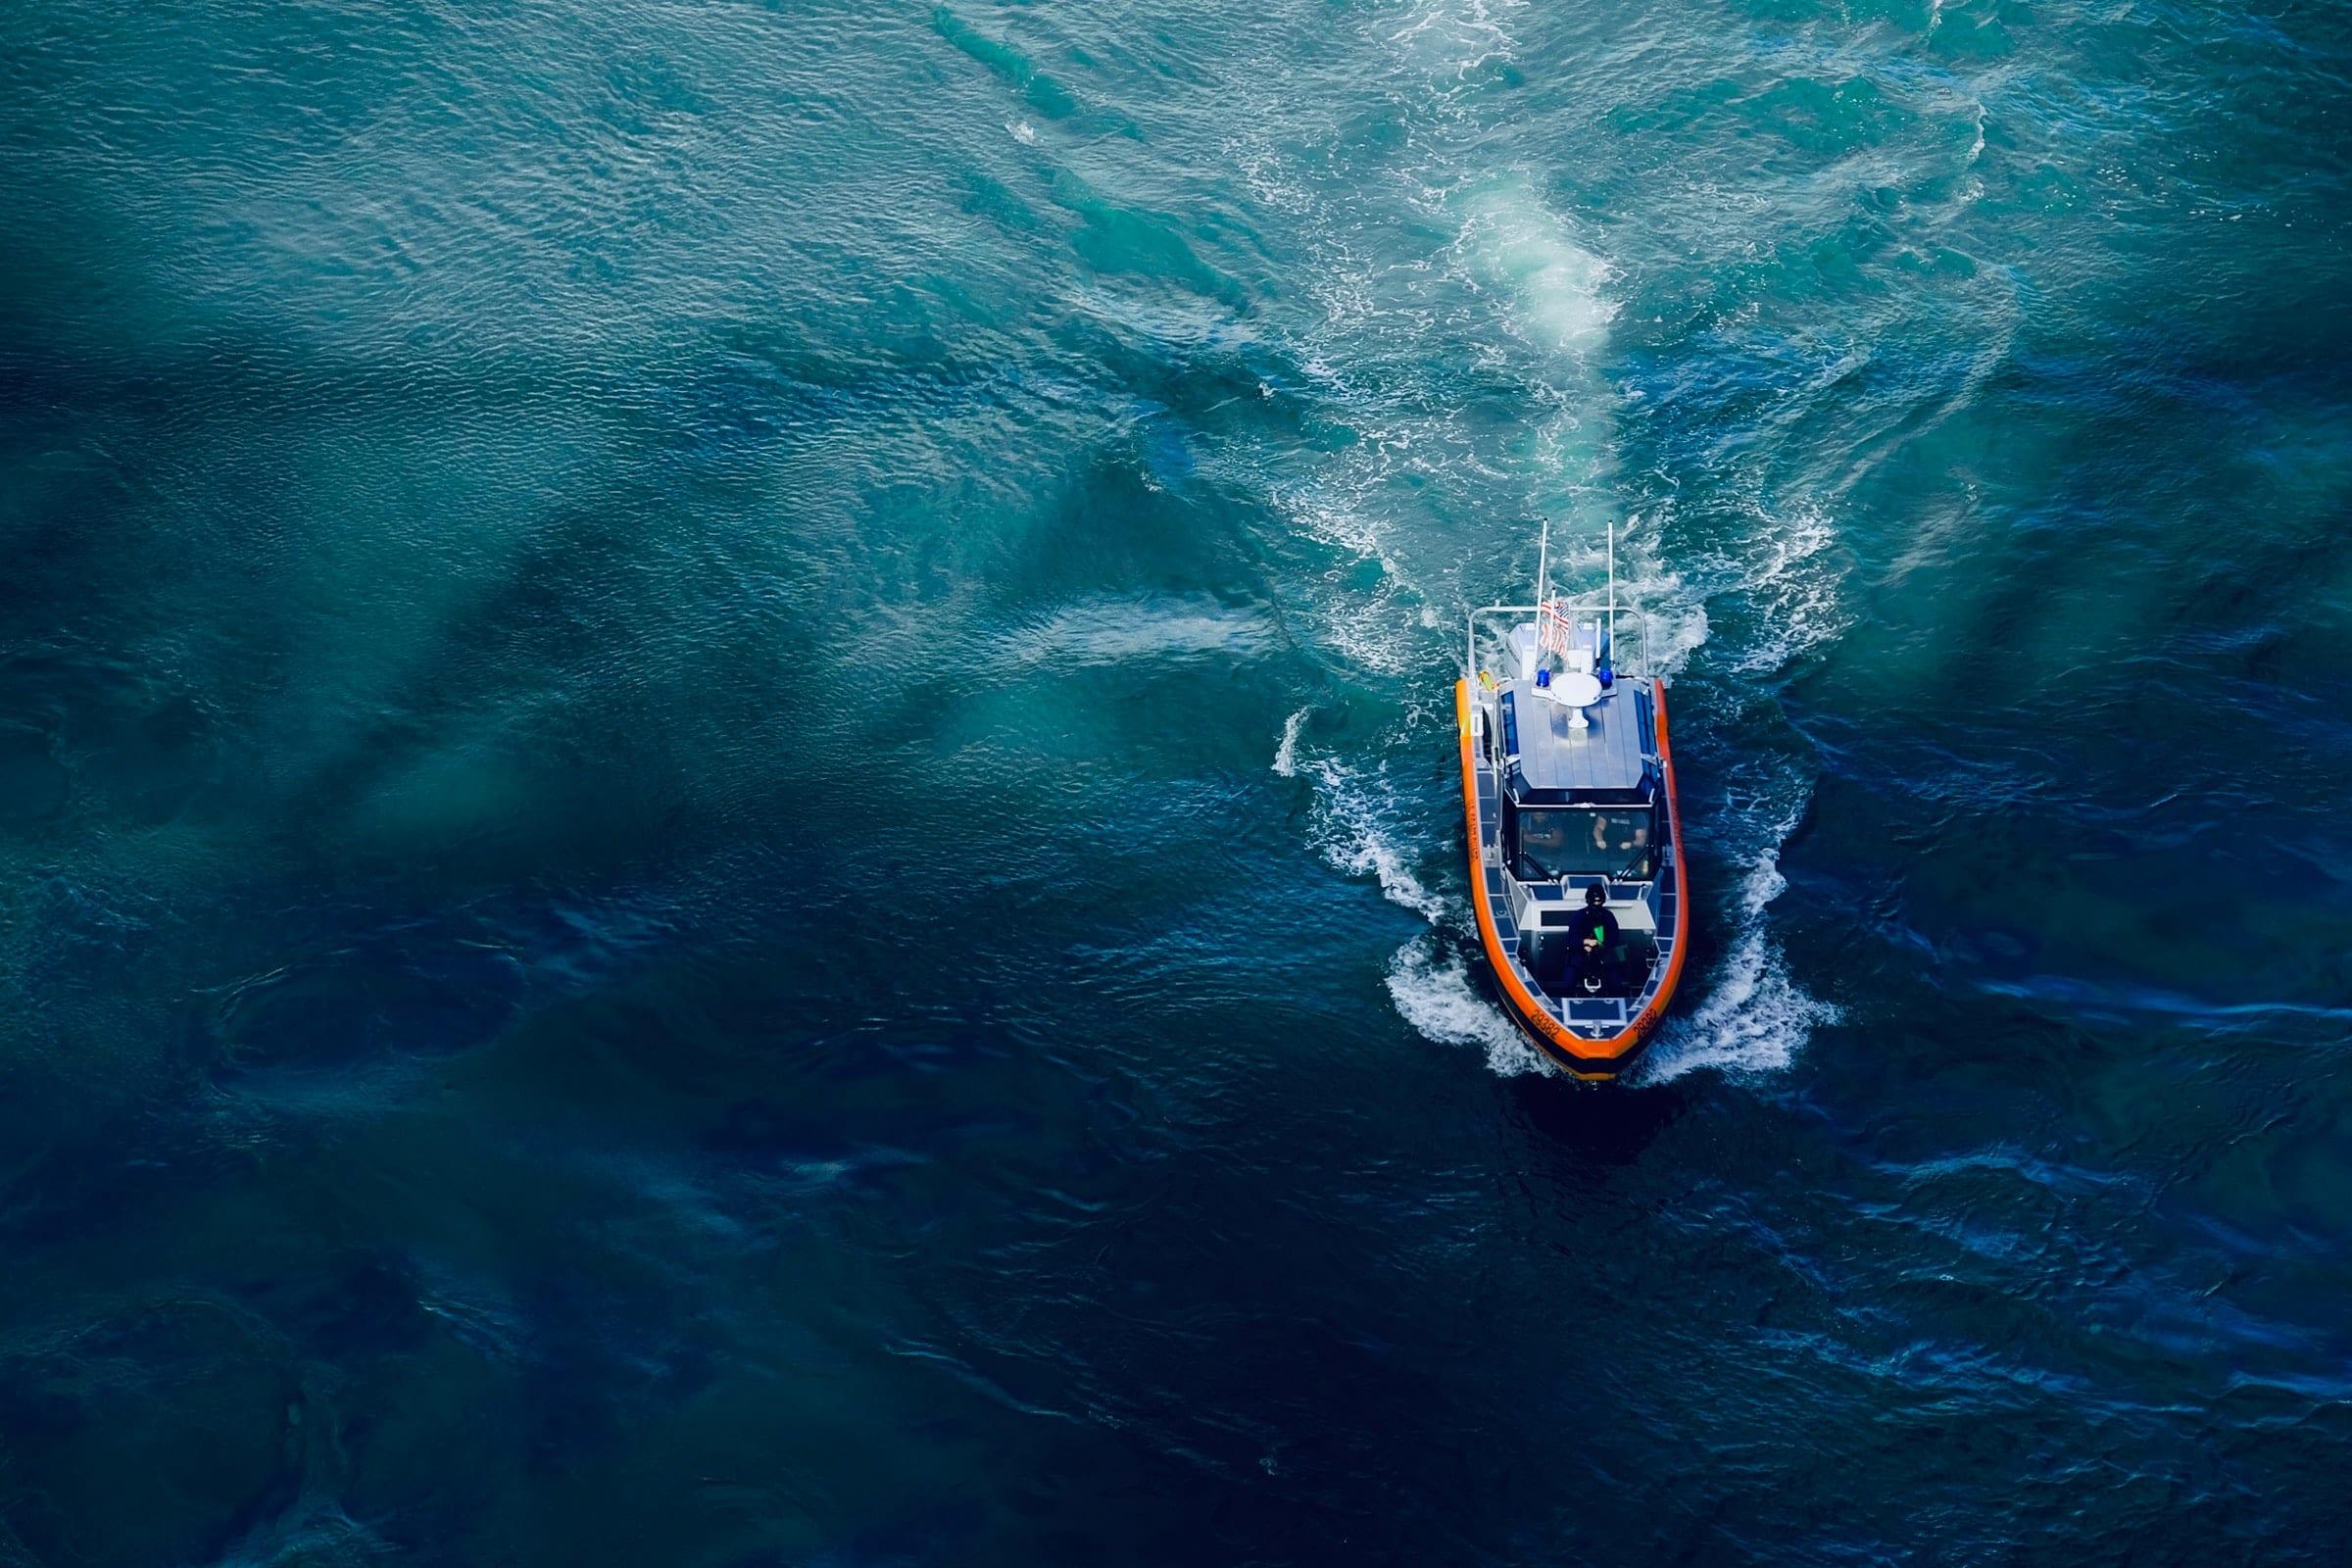 Rescue Boat in the Ocean